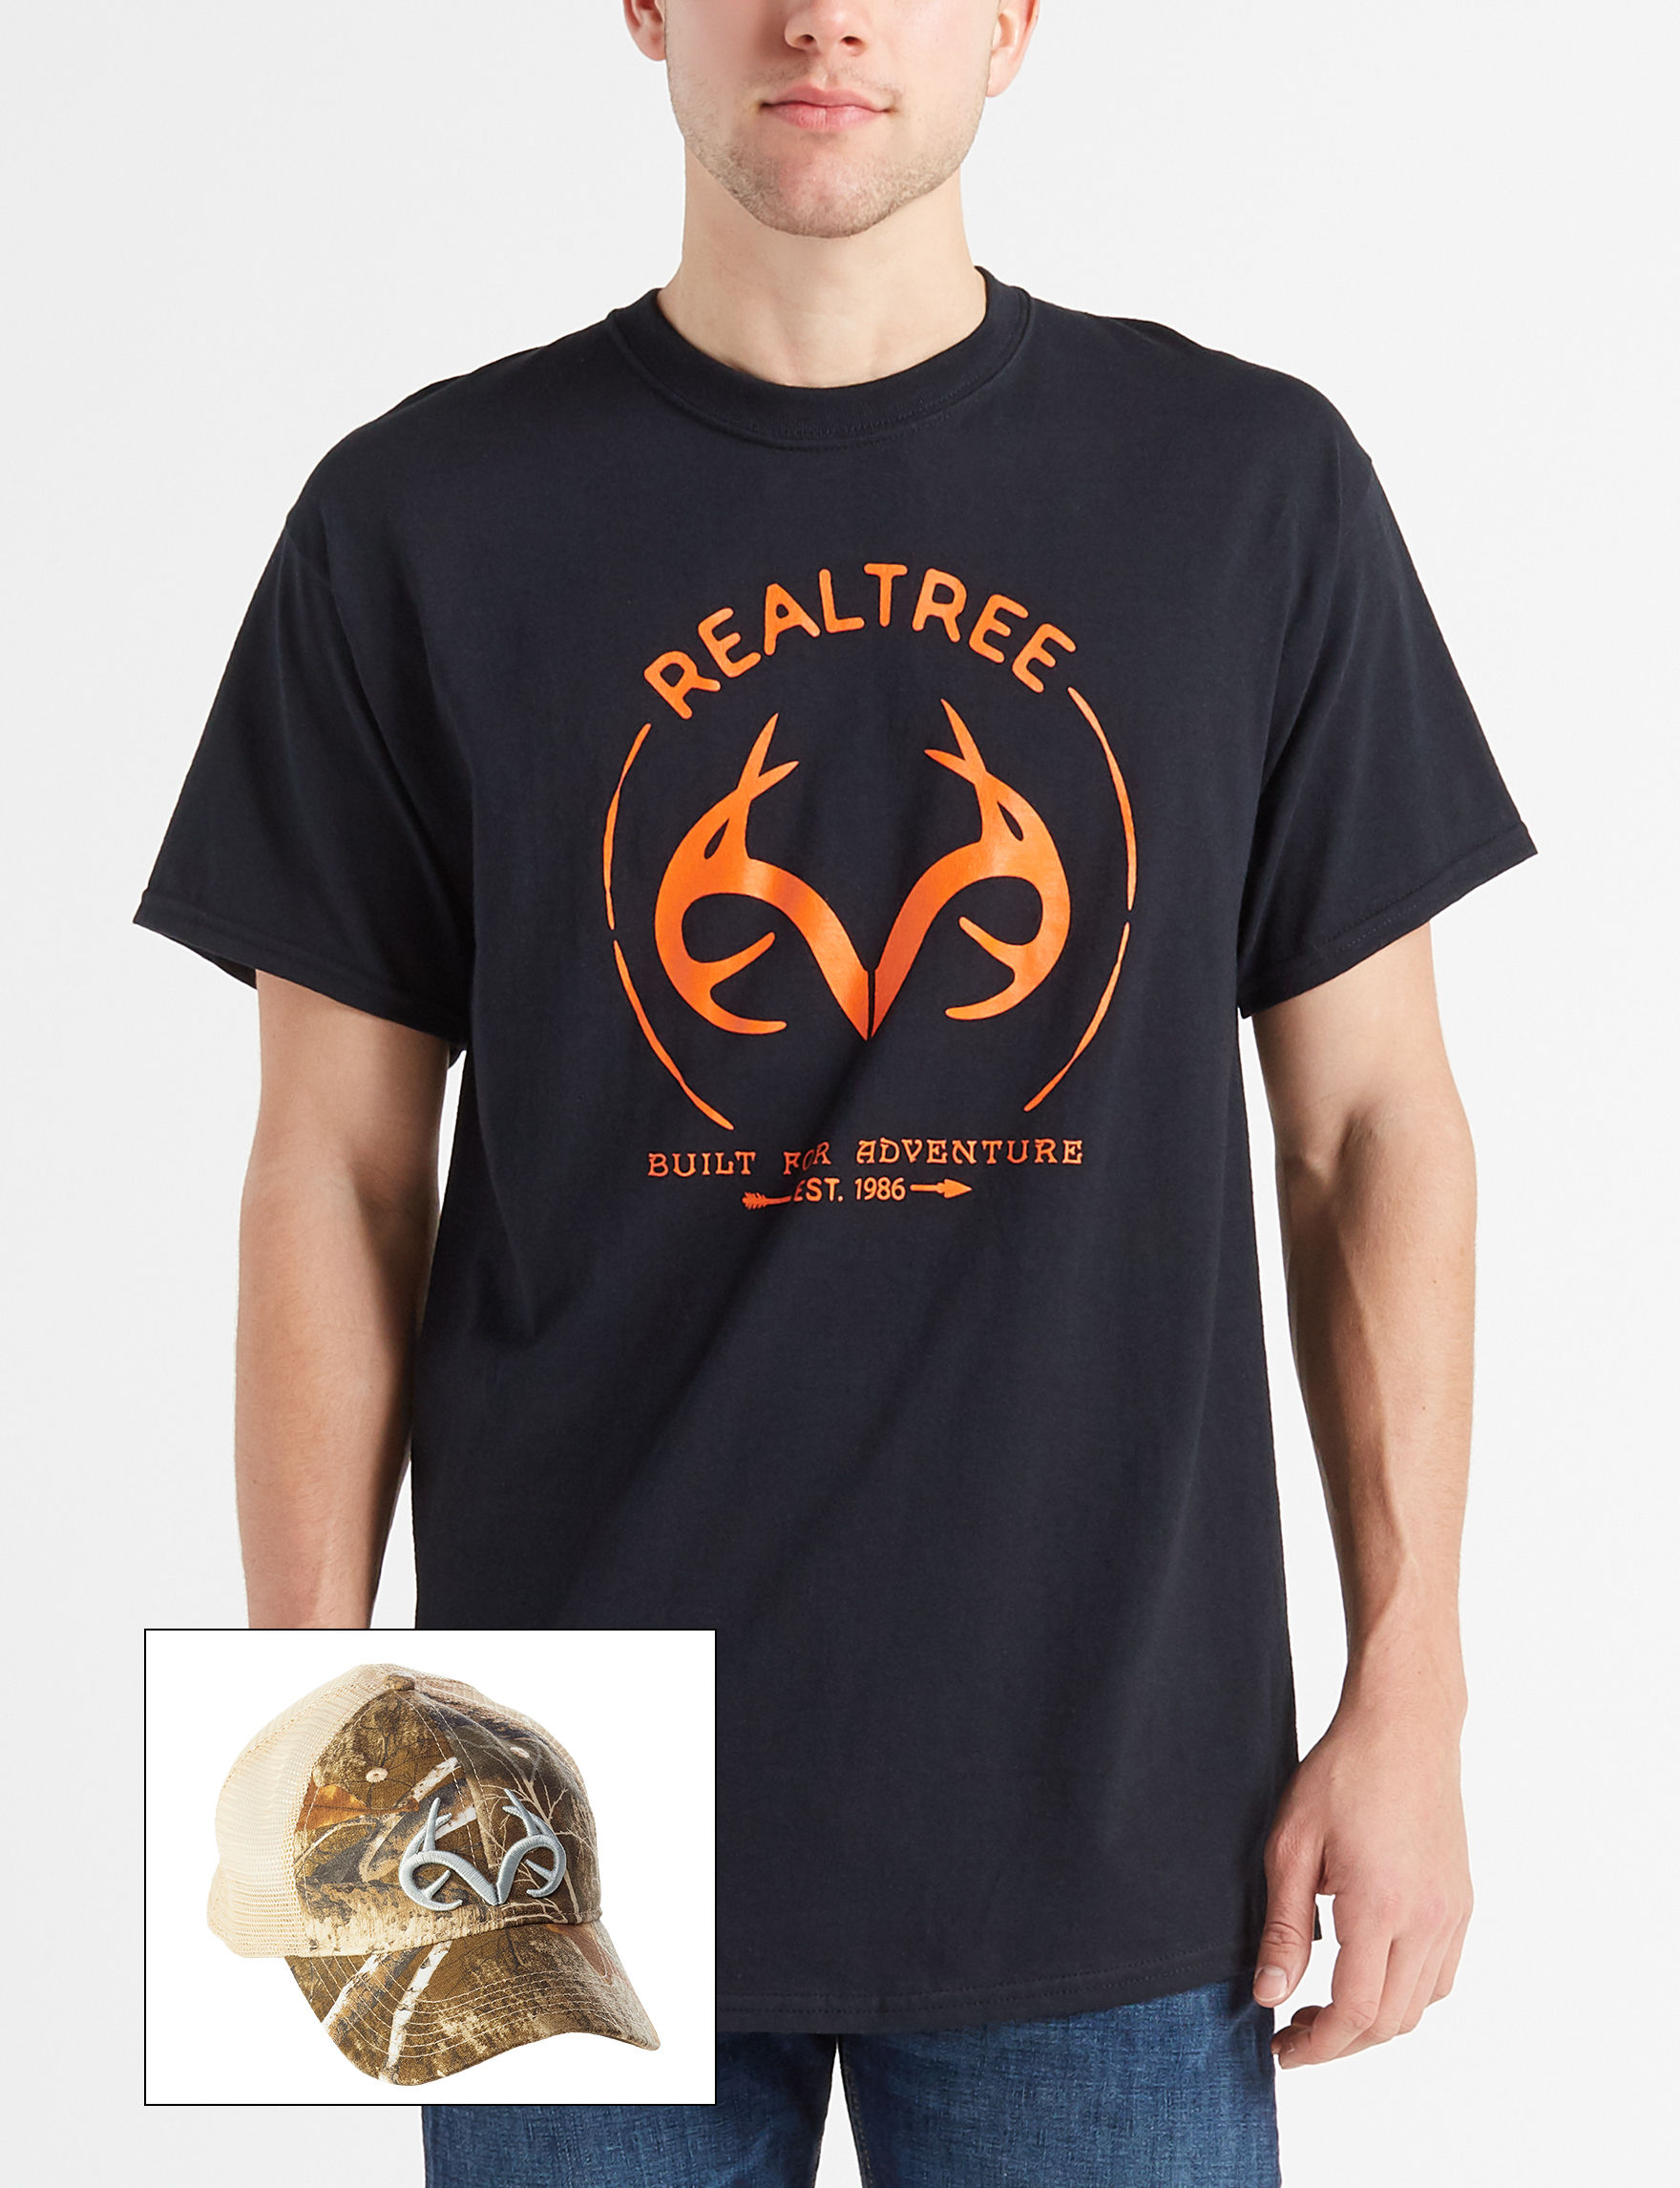 Realtree Black Camo Hats & Headwear Tees & Tanks